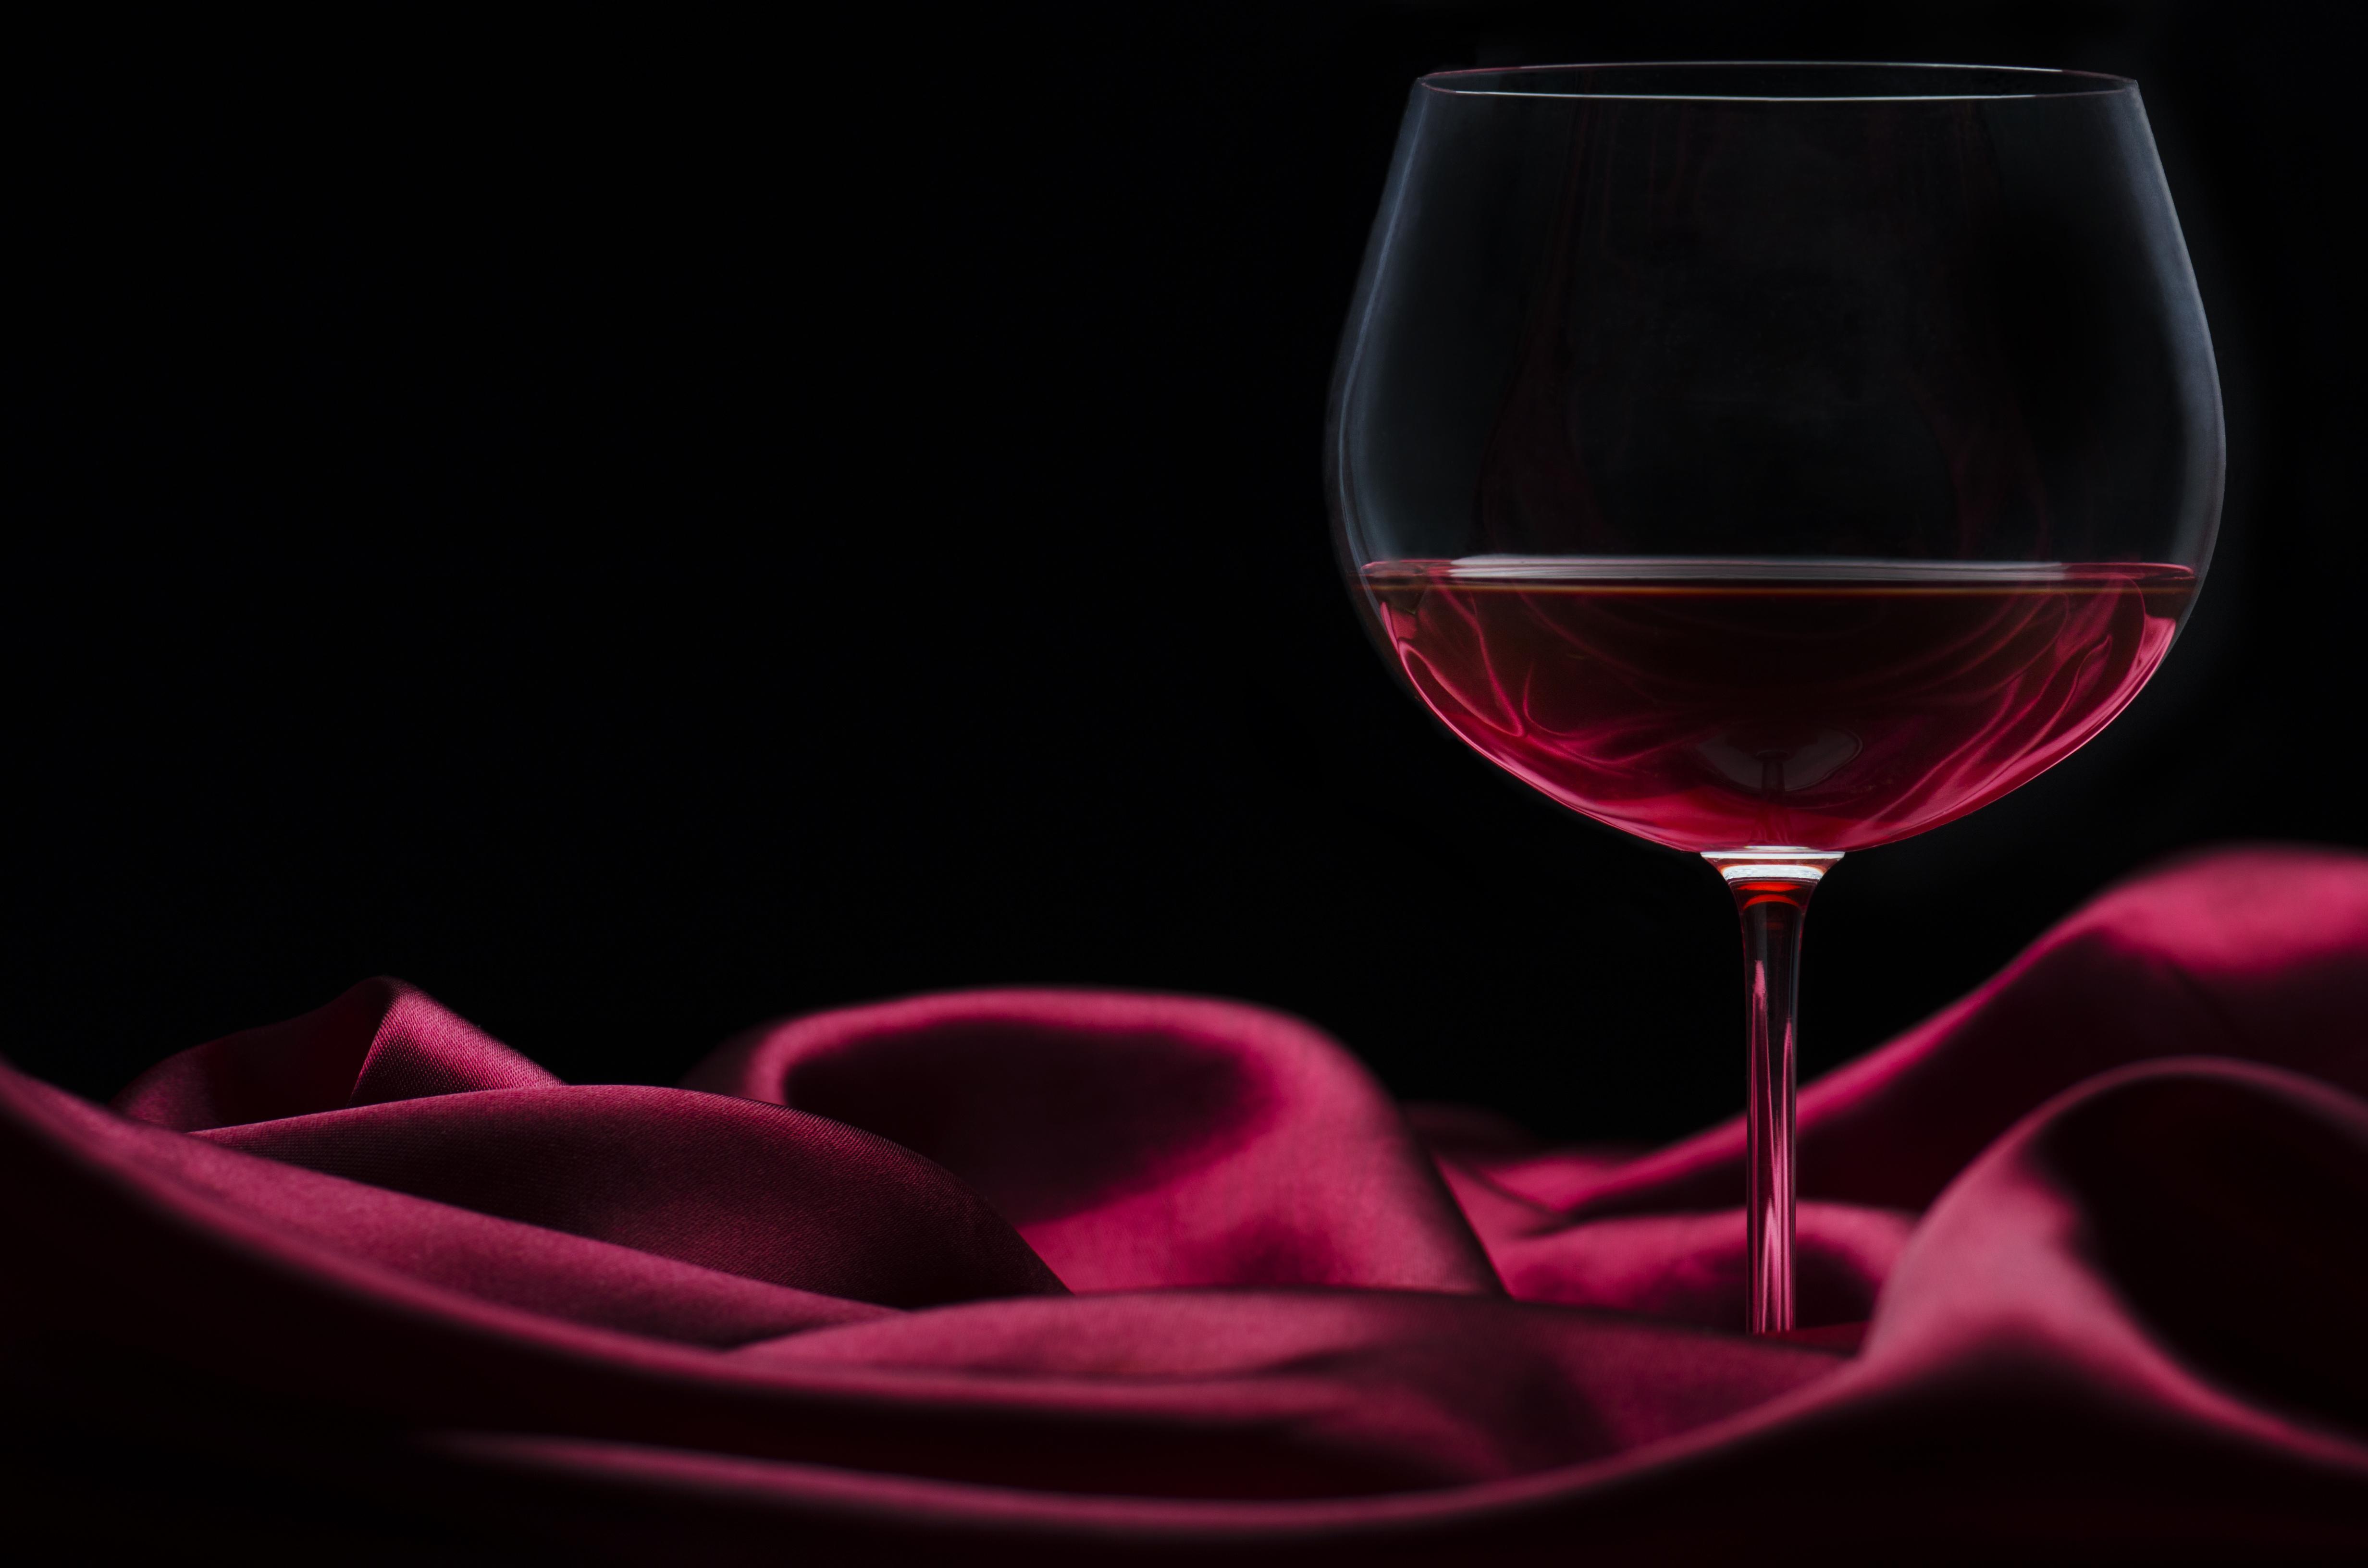 satin burgundy black background wallpapers miscellanea   download 4928x3264